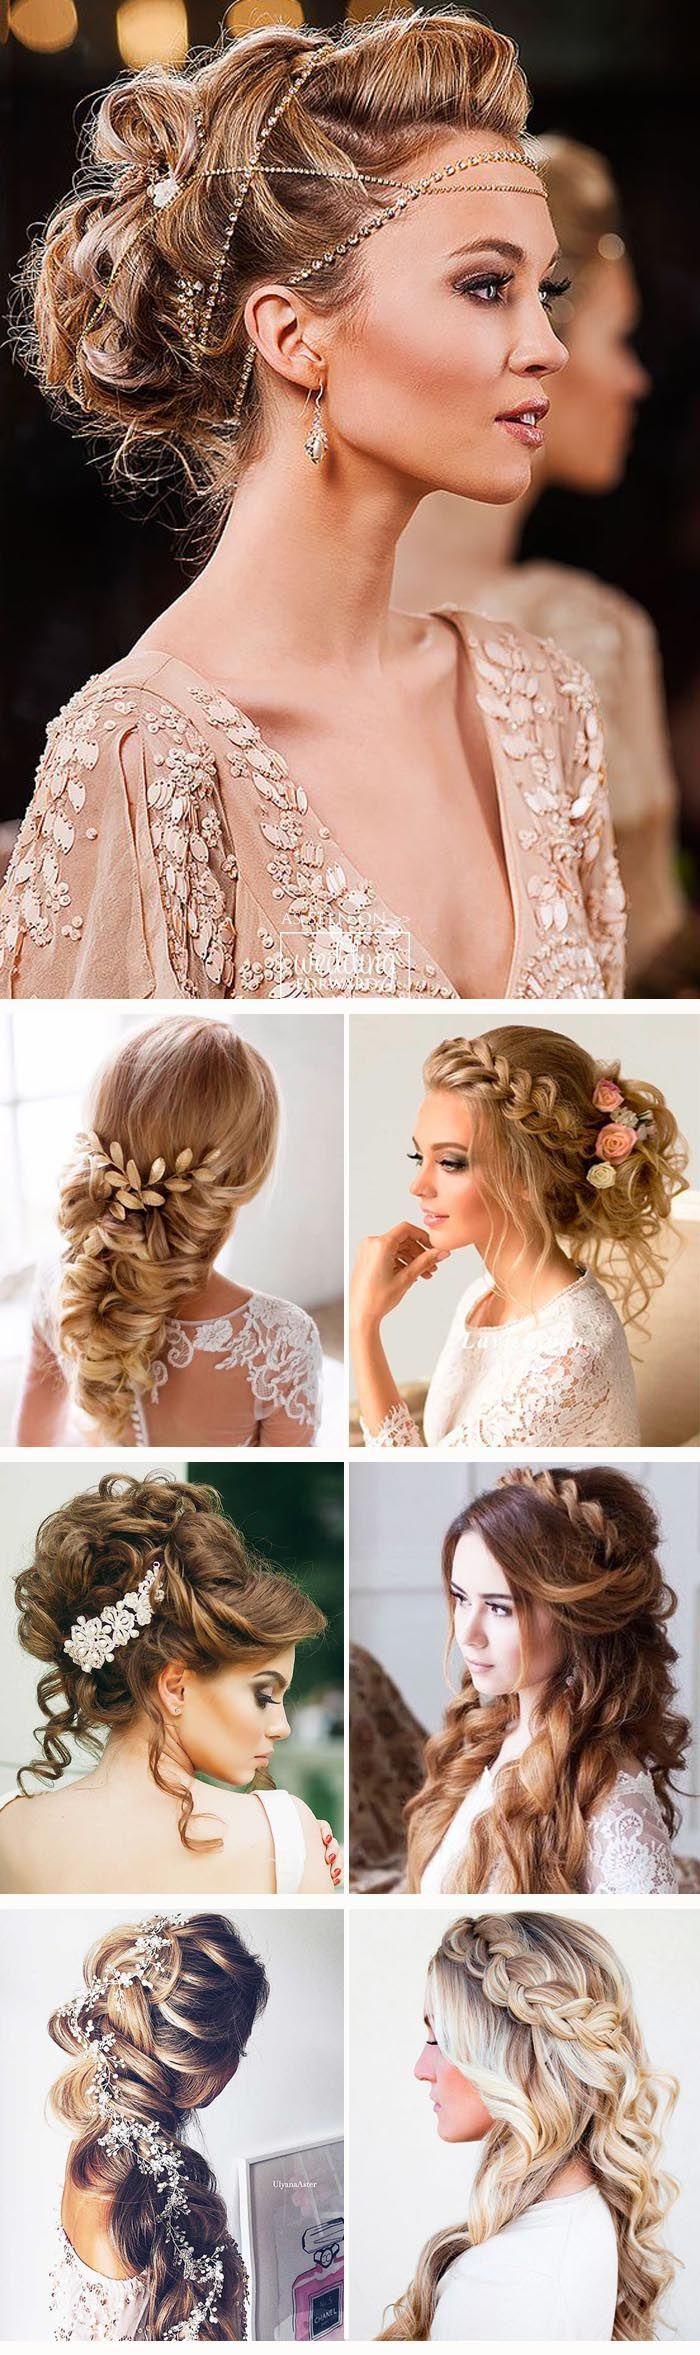 best wedding hairstyles images on pinterest hair ideas